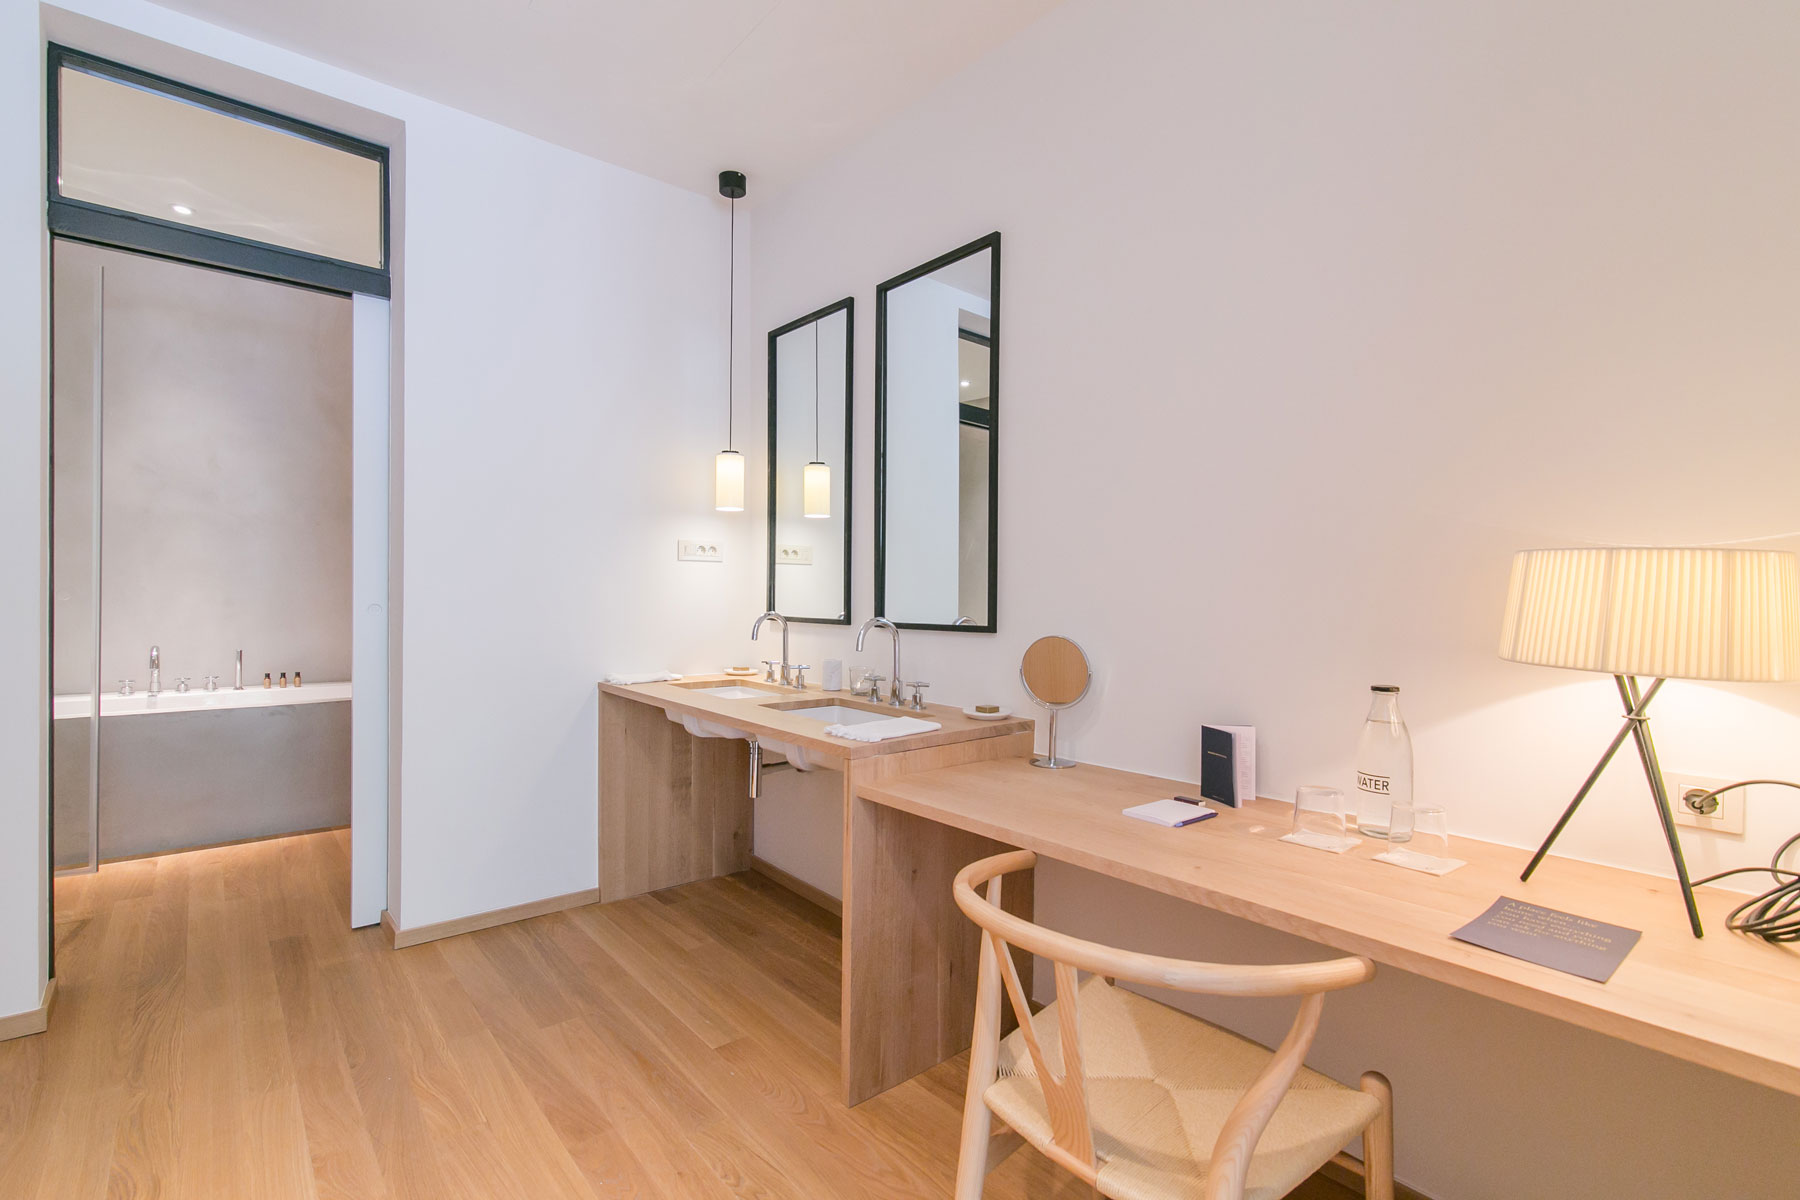 Minimalistisch strakke badkamer van Margot House